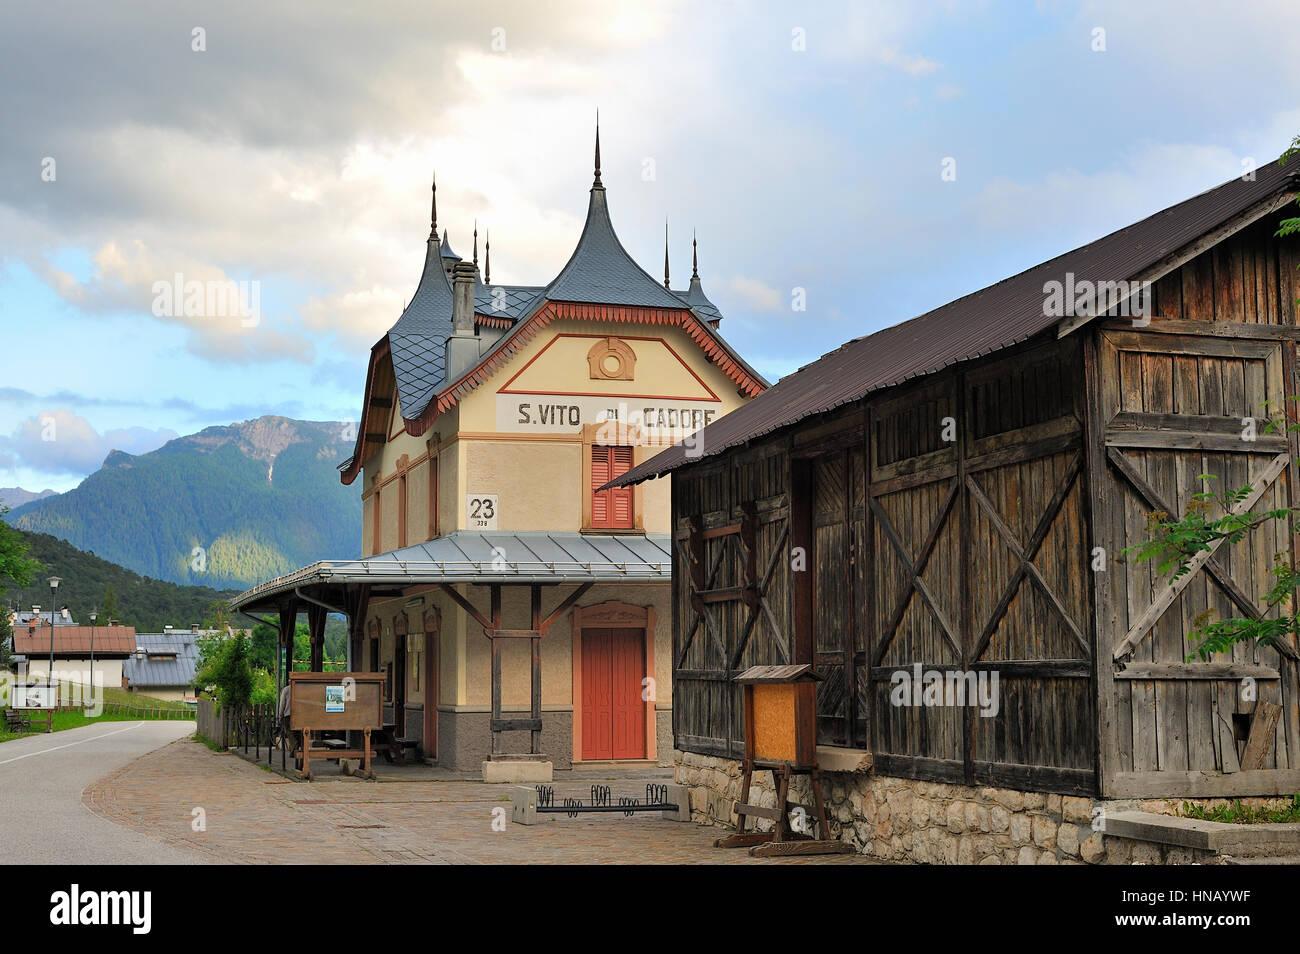 San Vito, Mountains of Cortina d'Ampezzo, Dolomiti Alps, Italy - Stock Image